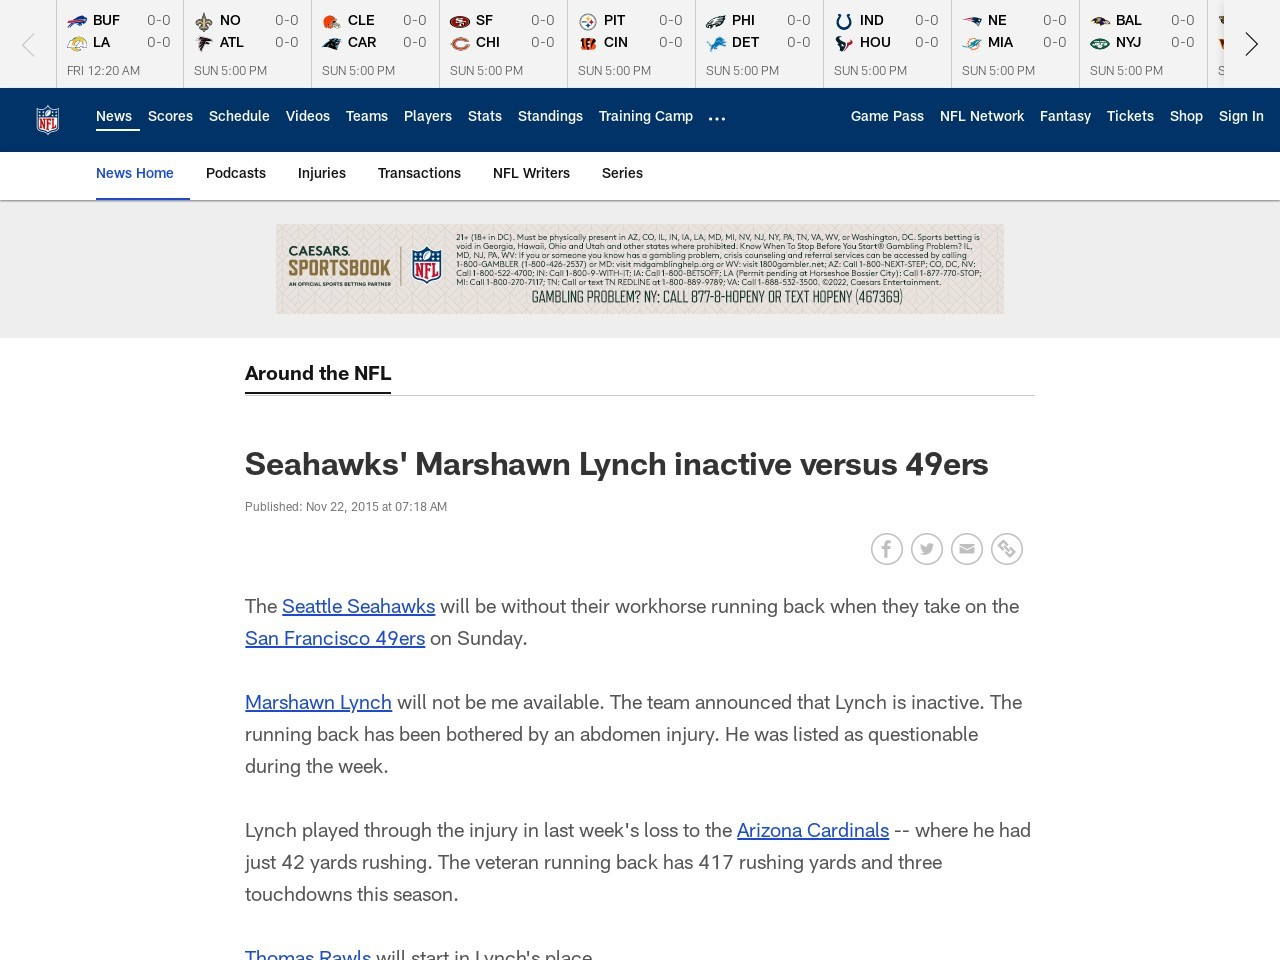 Seahawks' Marshawn Lynch inactive versus 49ers